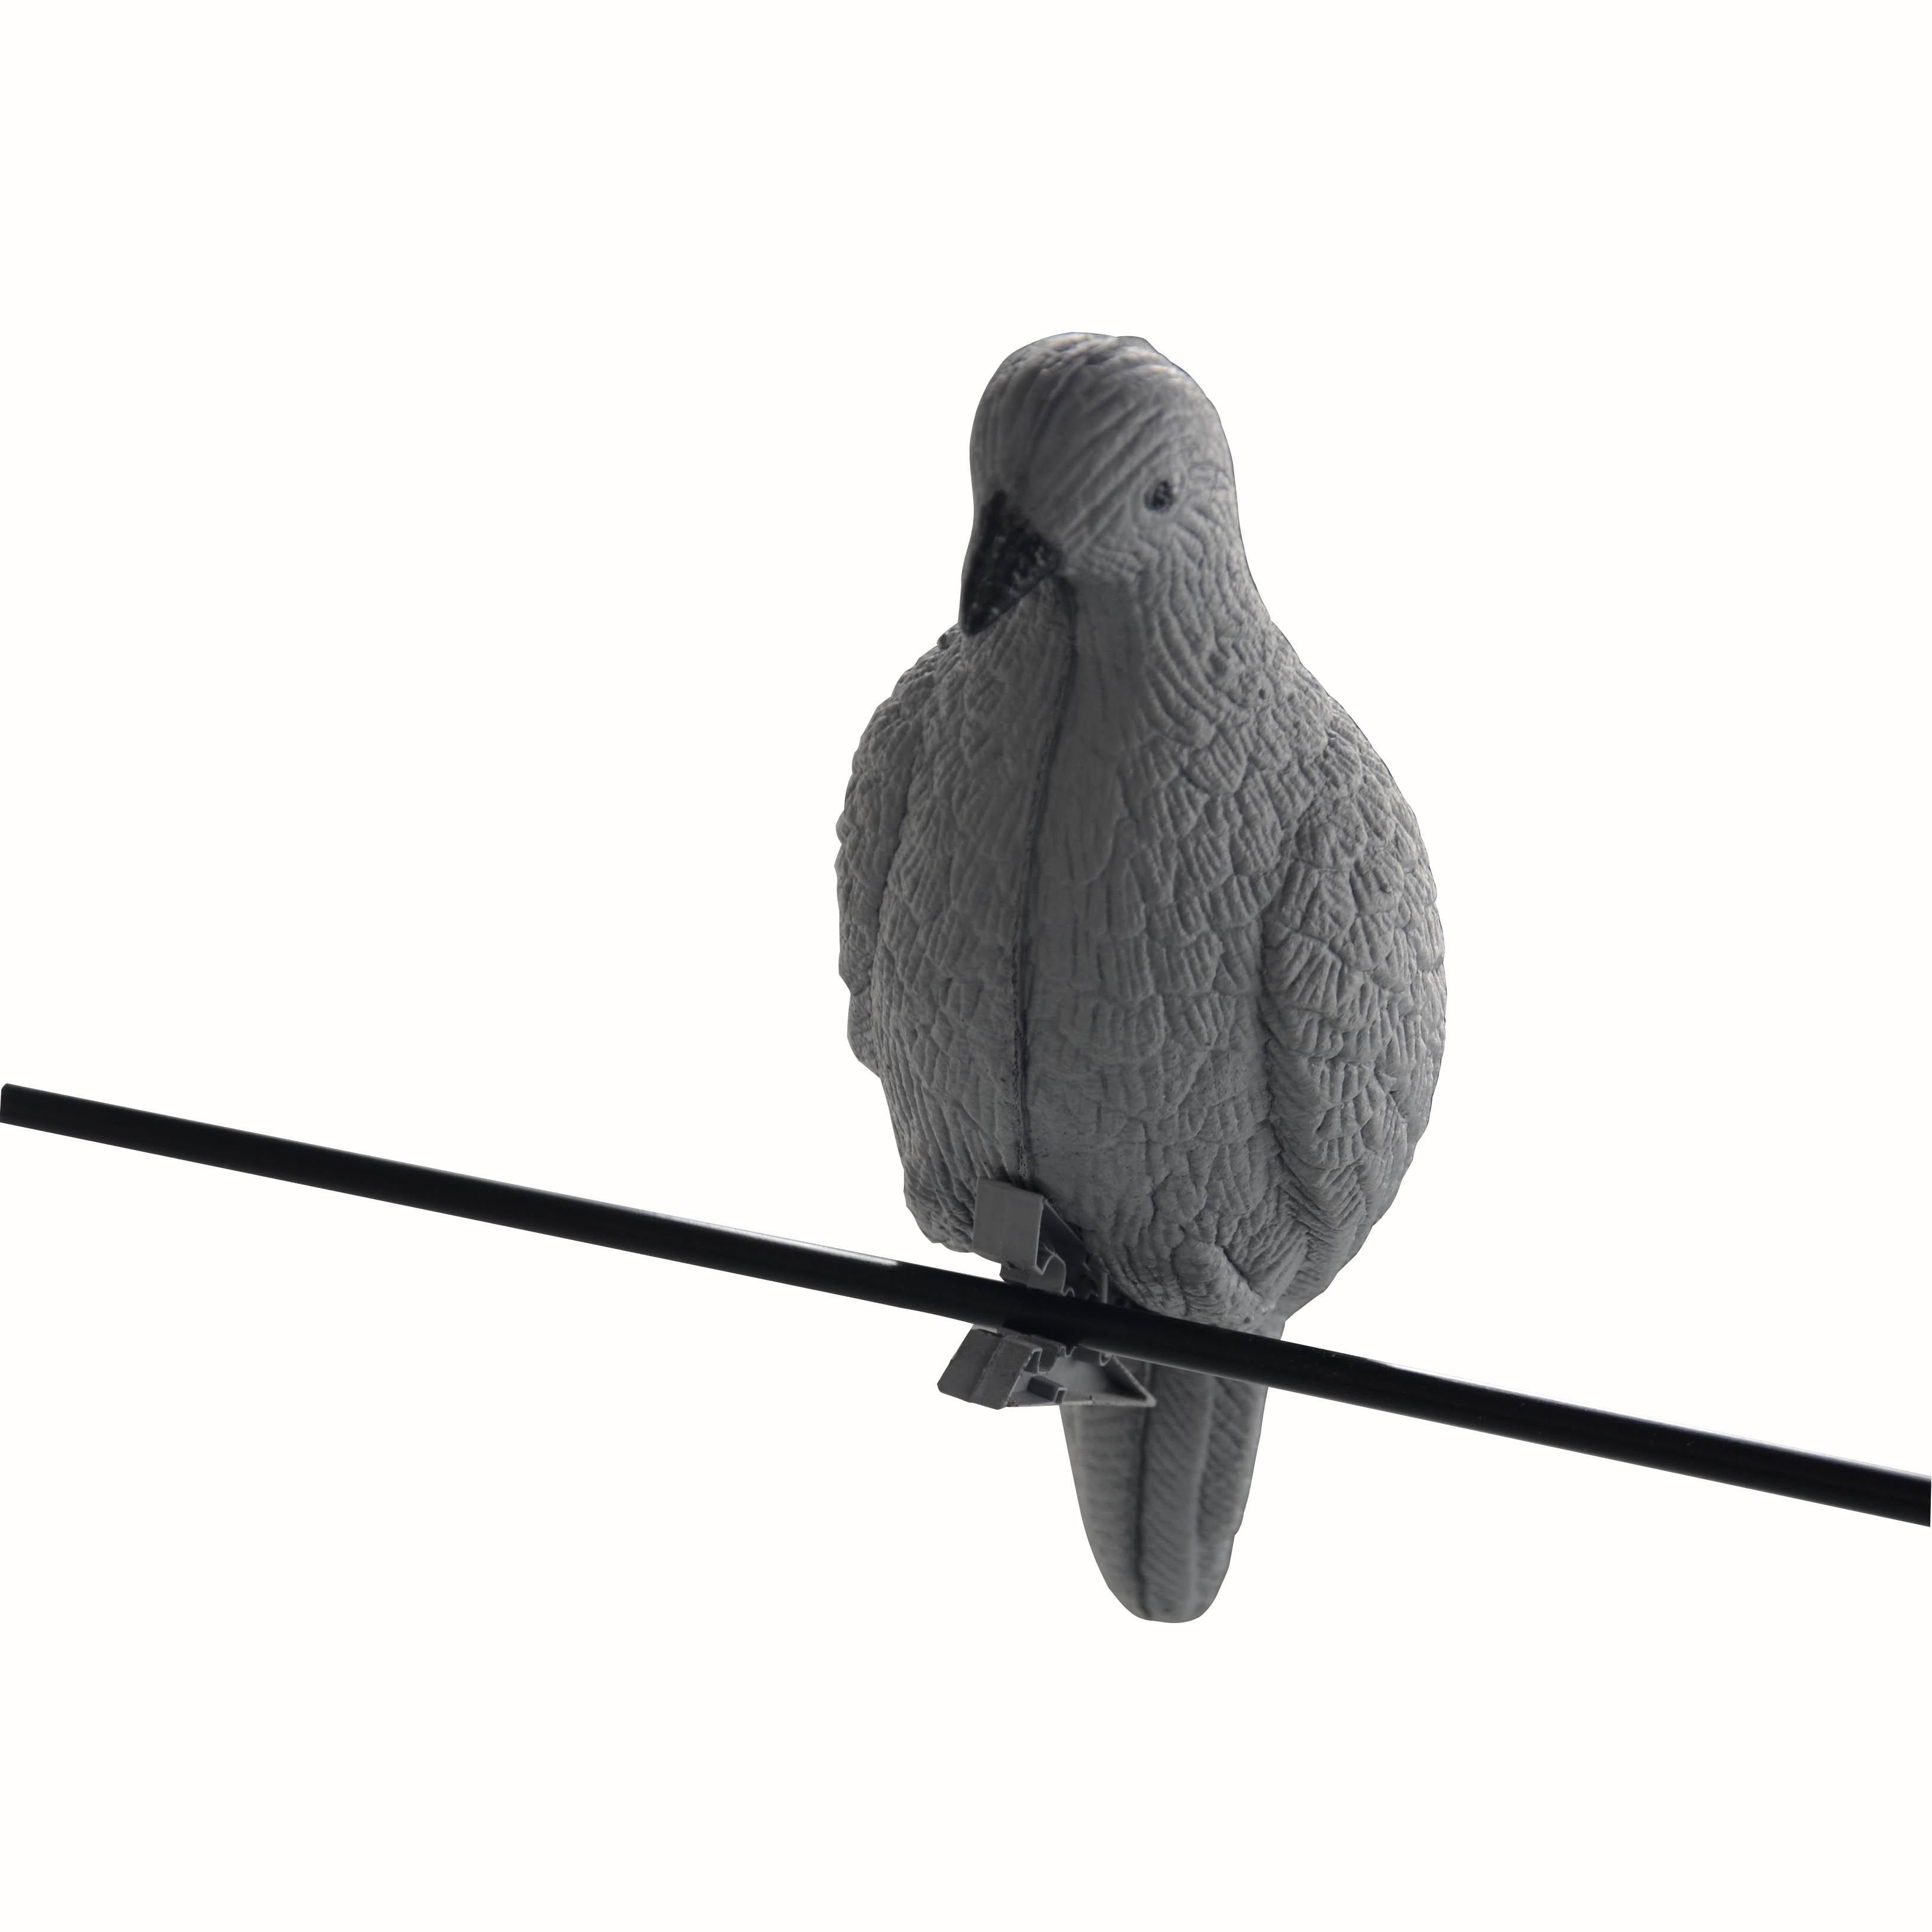 iscas para pombos vender por atacado iscas para pombos comprar por atacado da china online. Black Bedroom Furniture Sets. Home Design Ideas